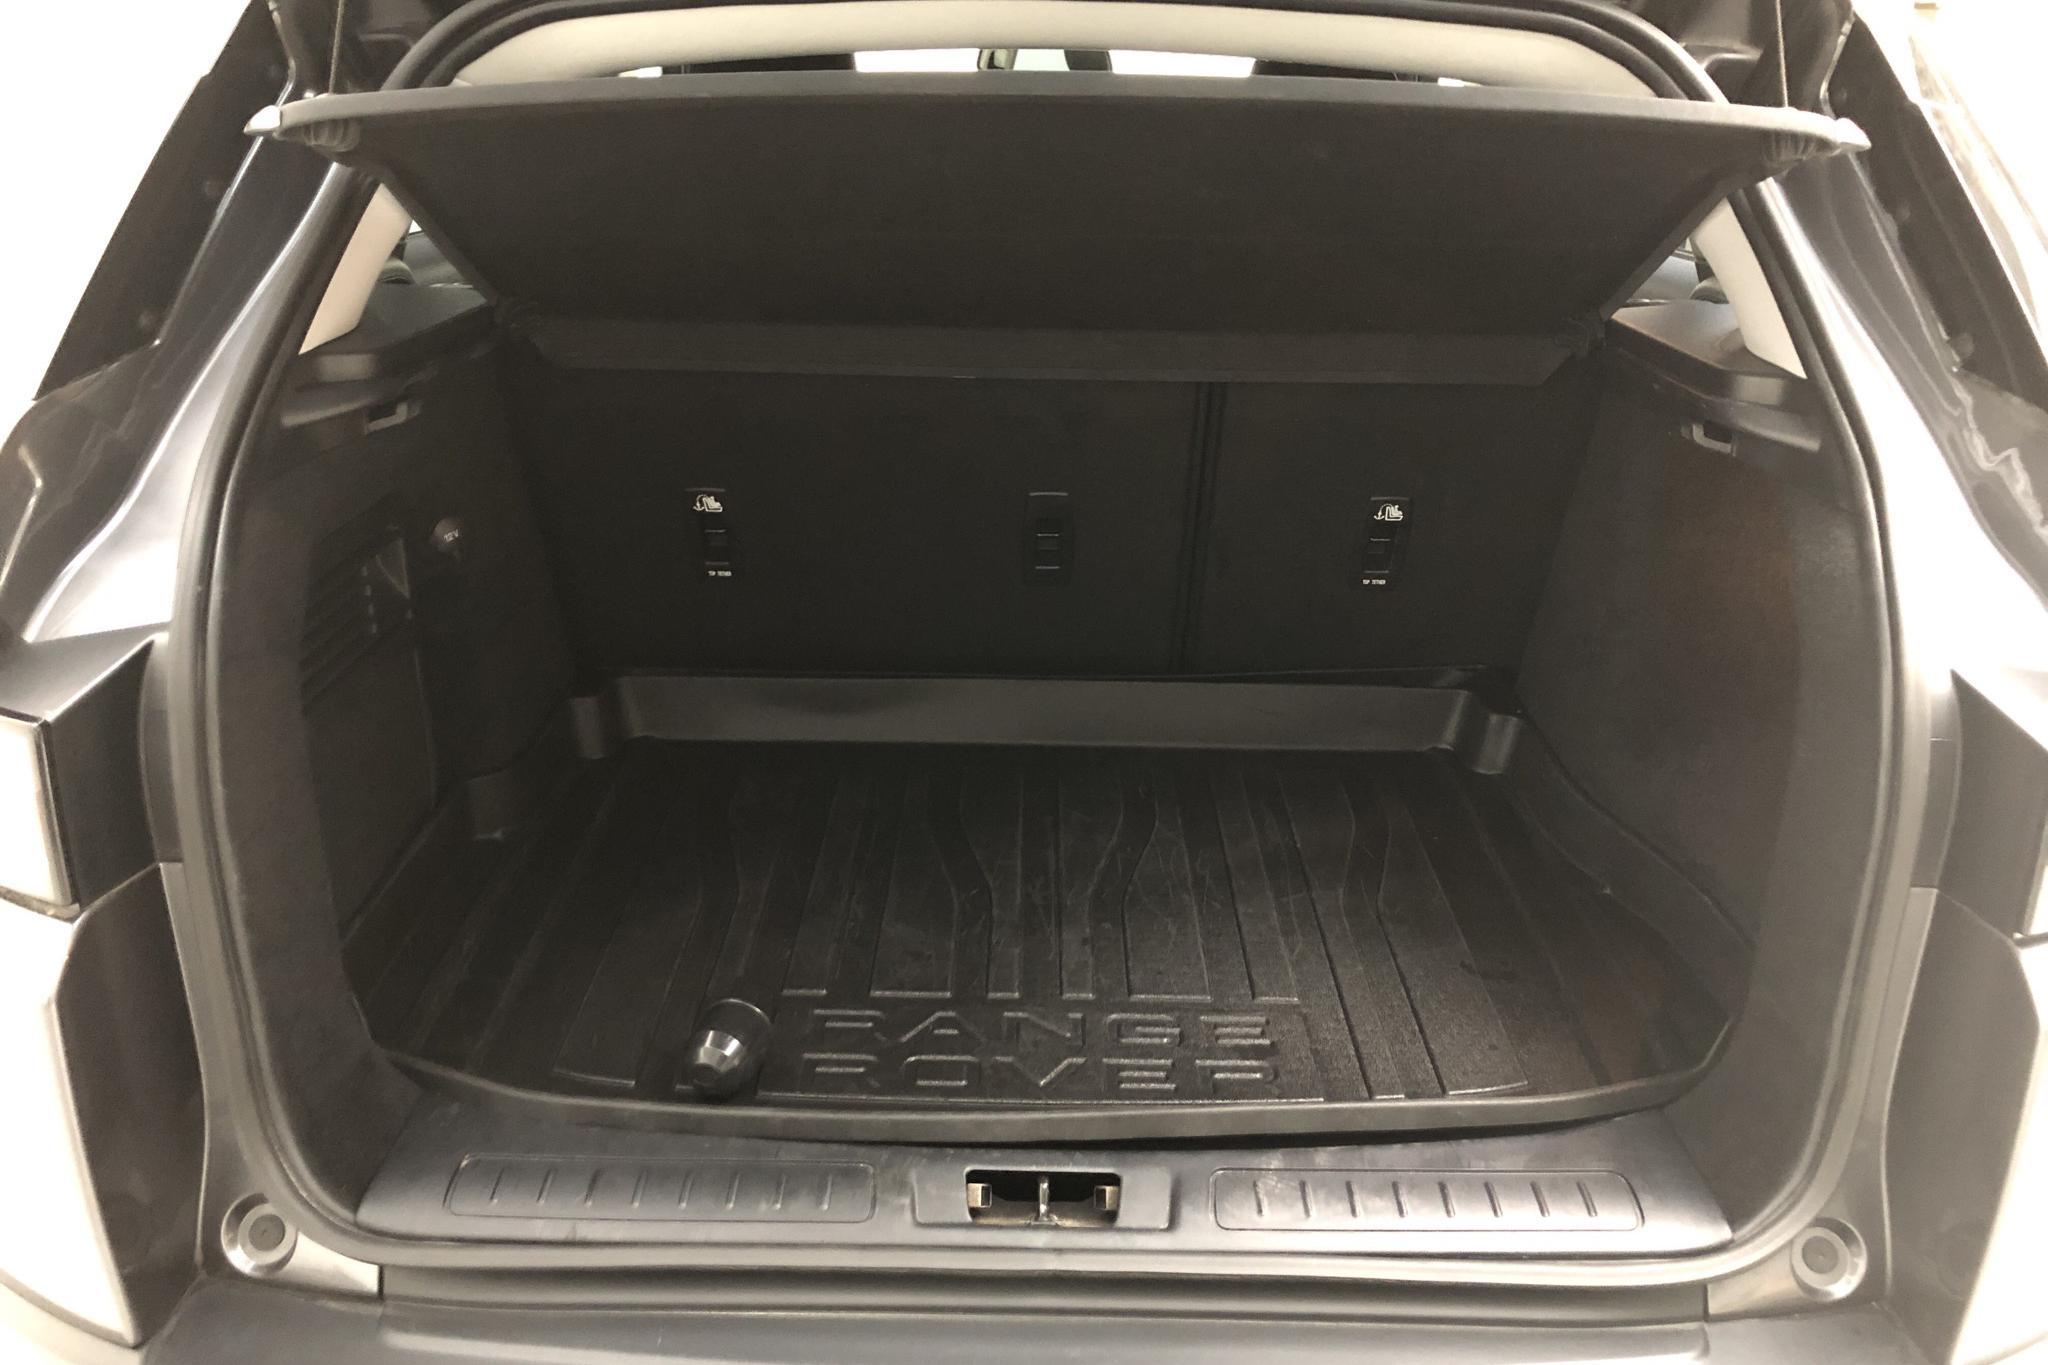 Land Rover Range Rover Evoque 2.0 TD4 AWD 5dr (150hk) - 3 659 mil - Automat - grå - 2017